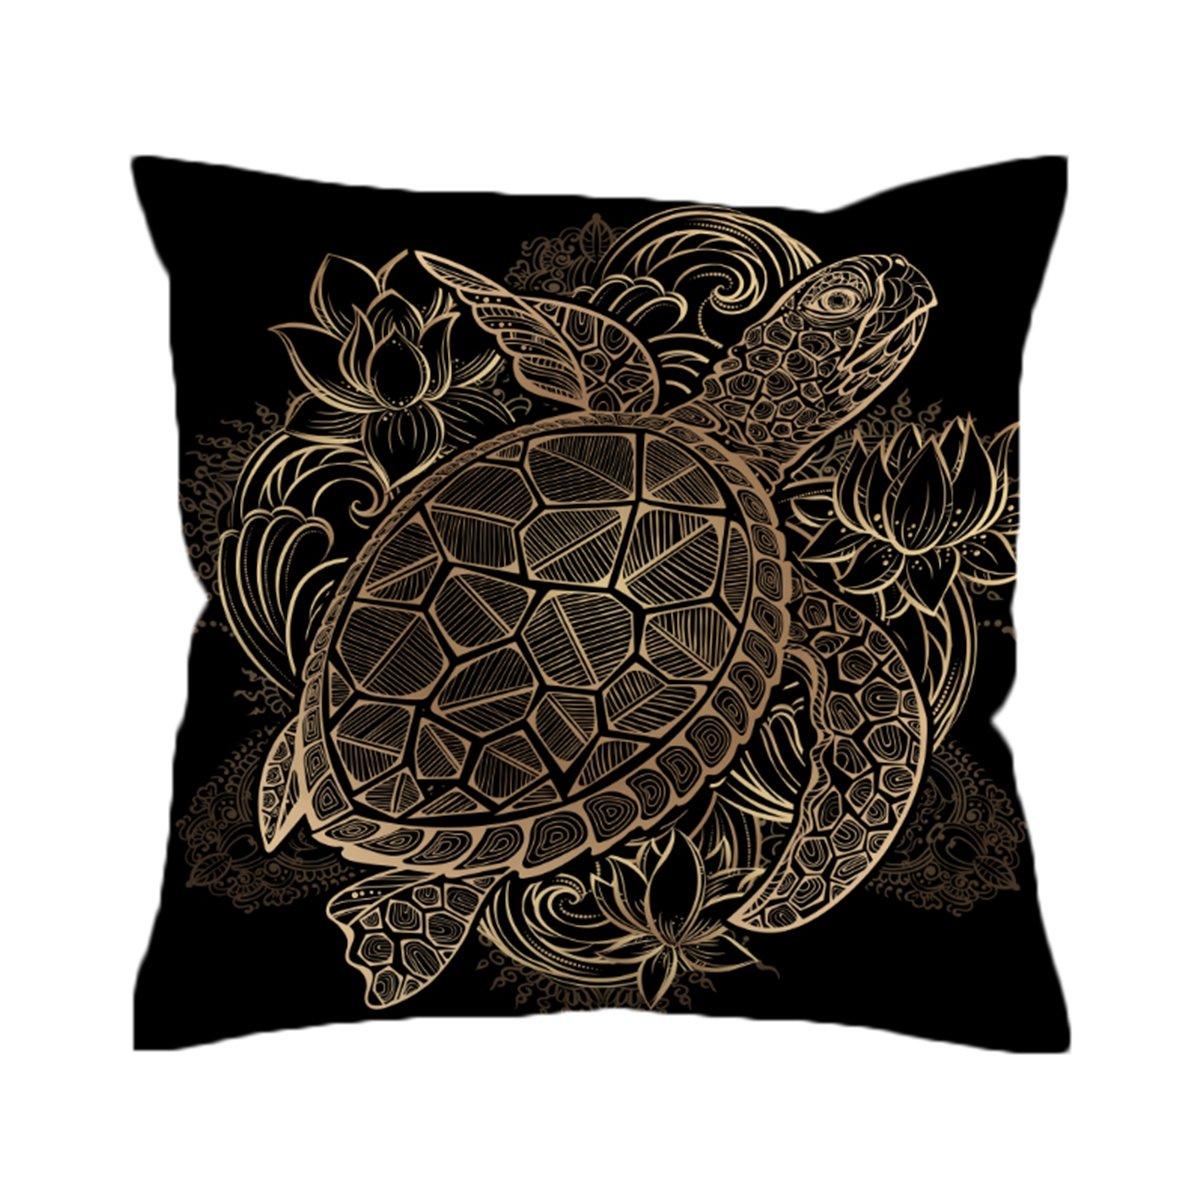 Amazoncom Sleepwish Cushion Cover 18 X 18 Black And Gold